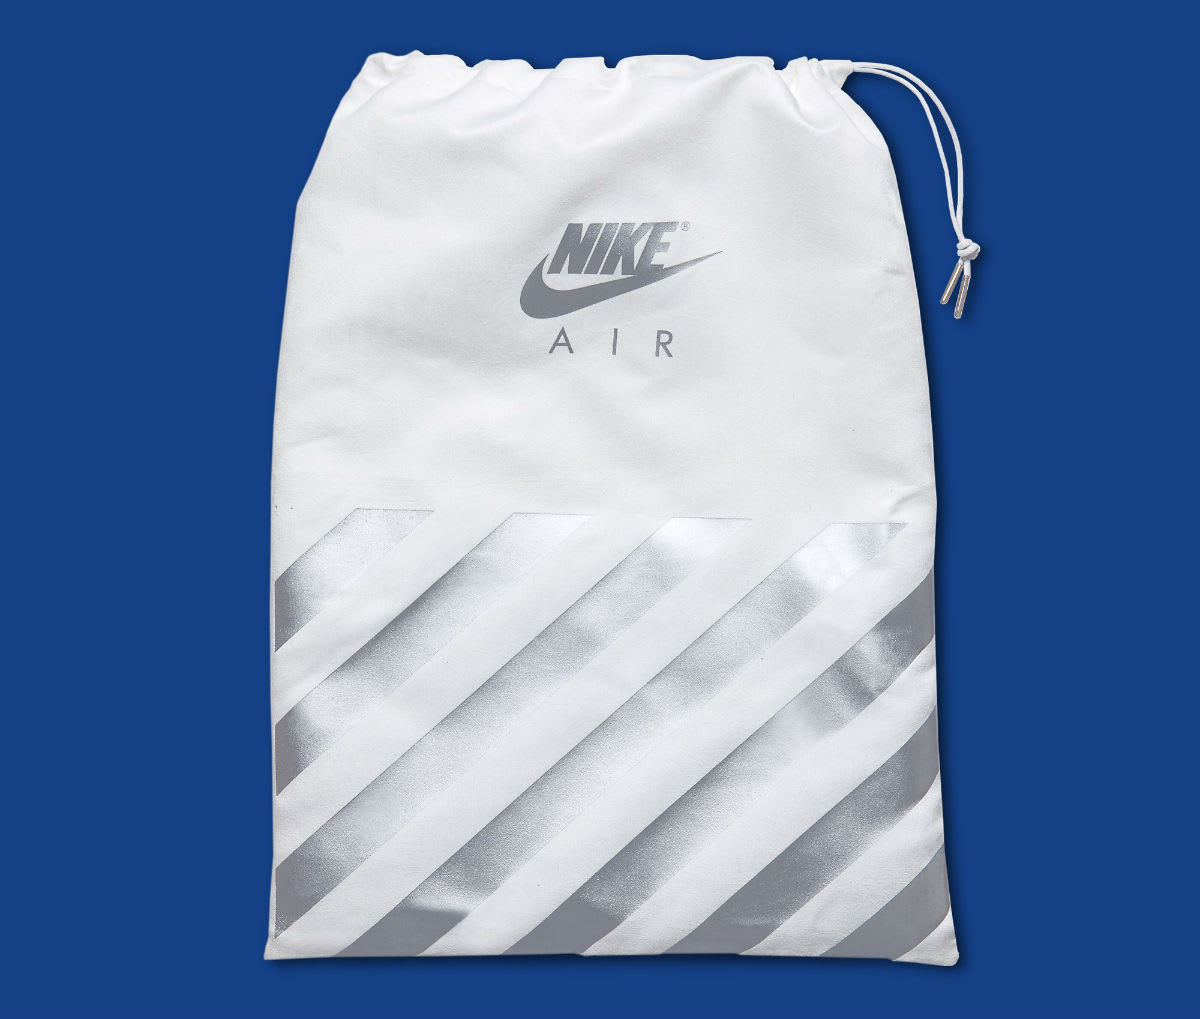 Nike Air Max 1 OG Blue Anniversary Release Date Bag 908375-101